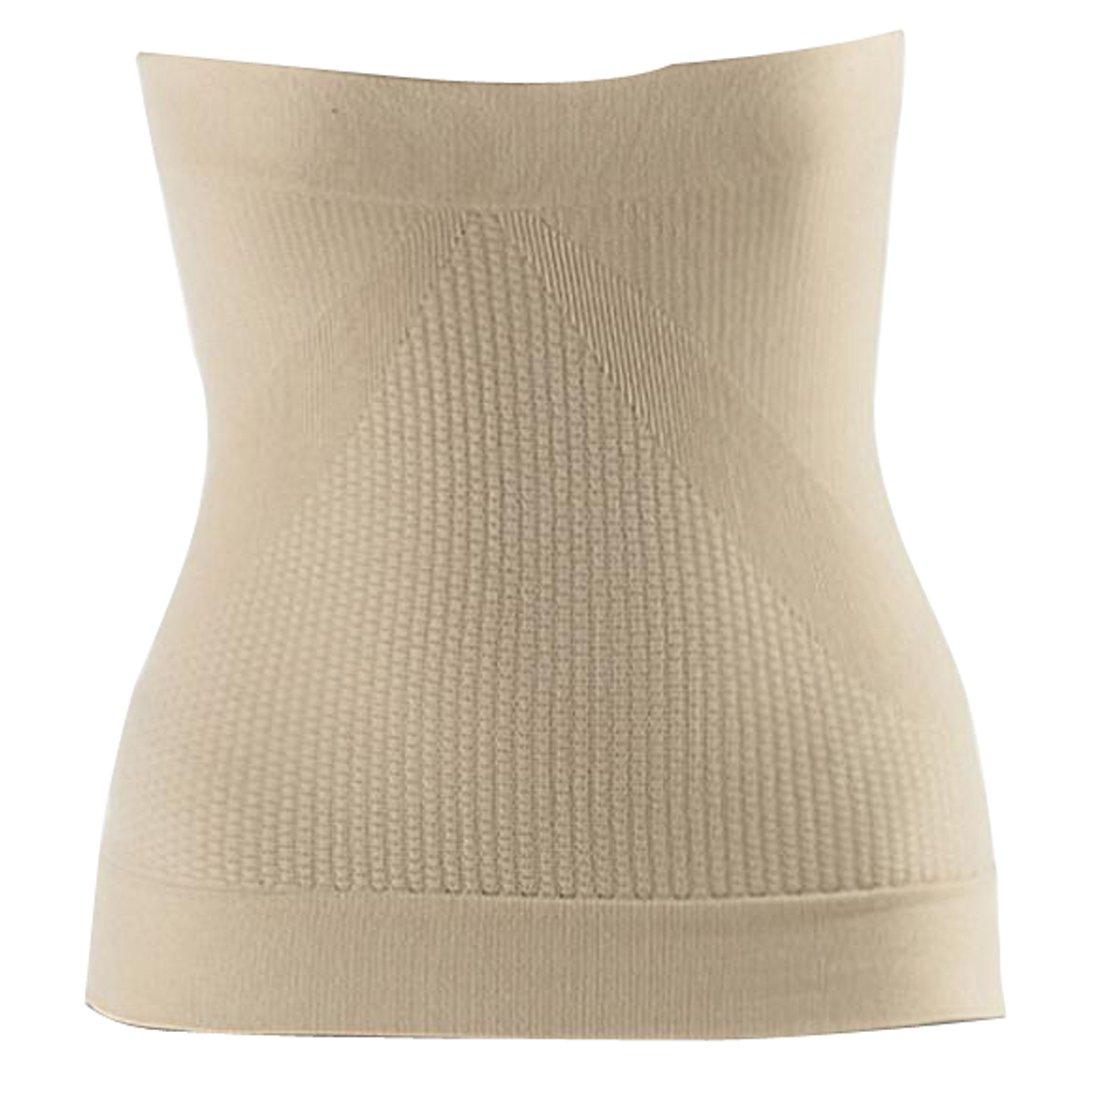 Glield Elastic Postpartum Pregnancy Belt-Support Waist Belt Slimming Shaper YFD02